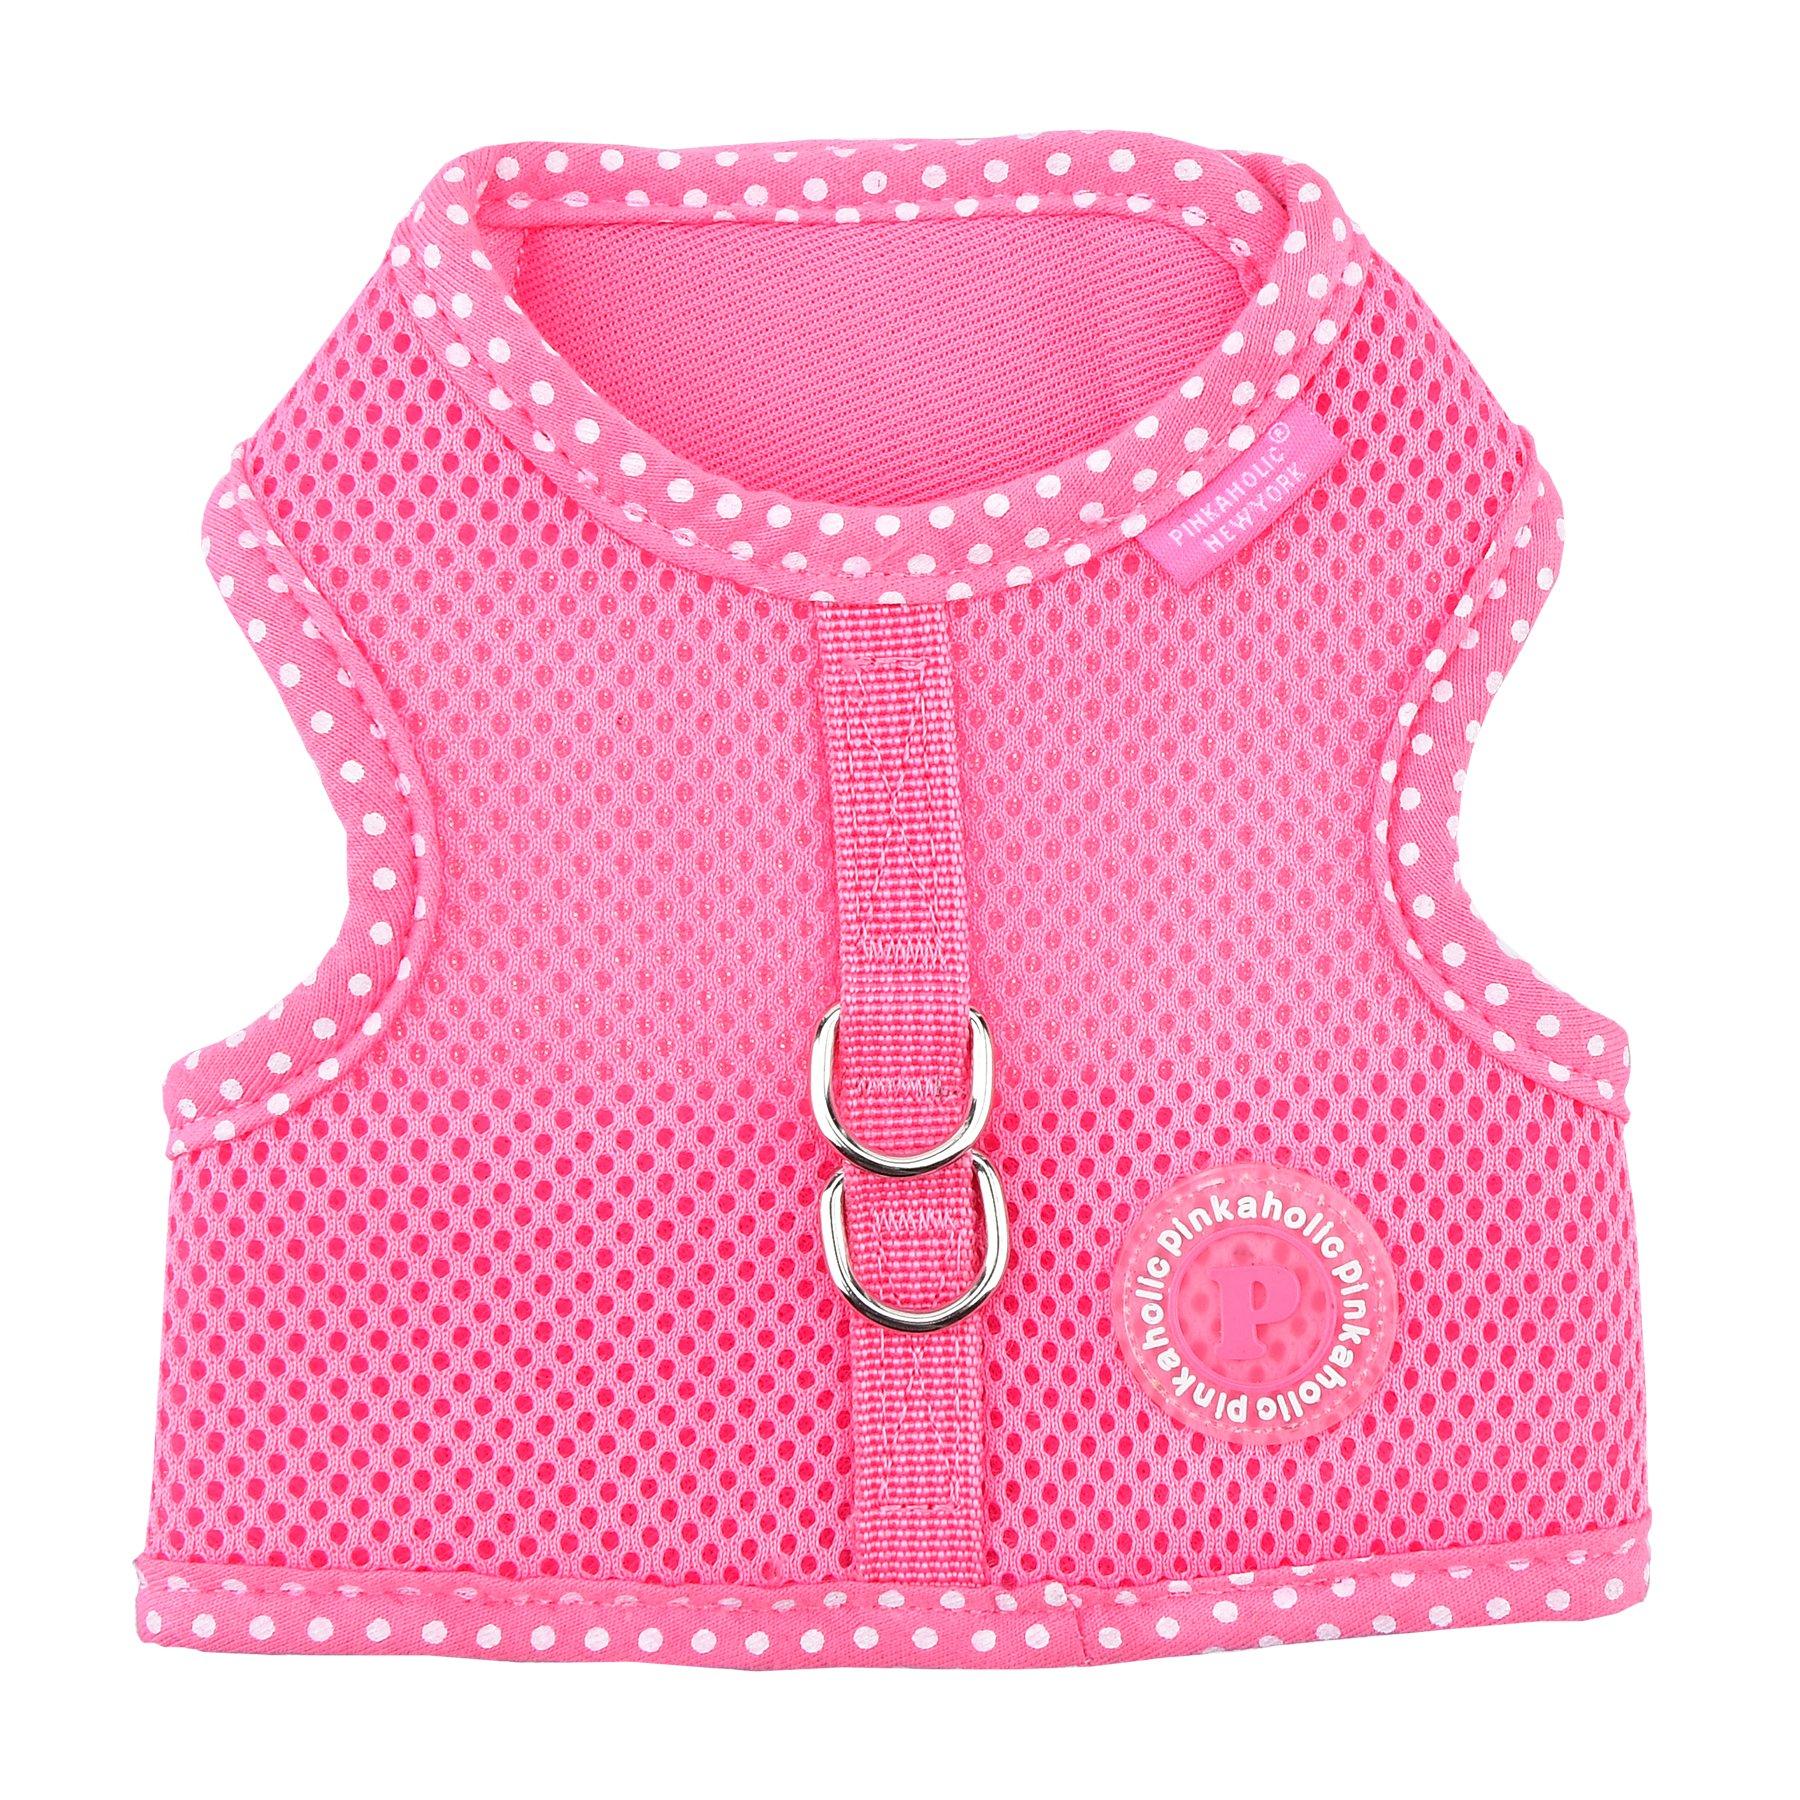 Pinkaholic New York Niki PINKA Harness - Pink - S